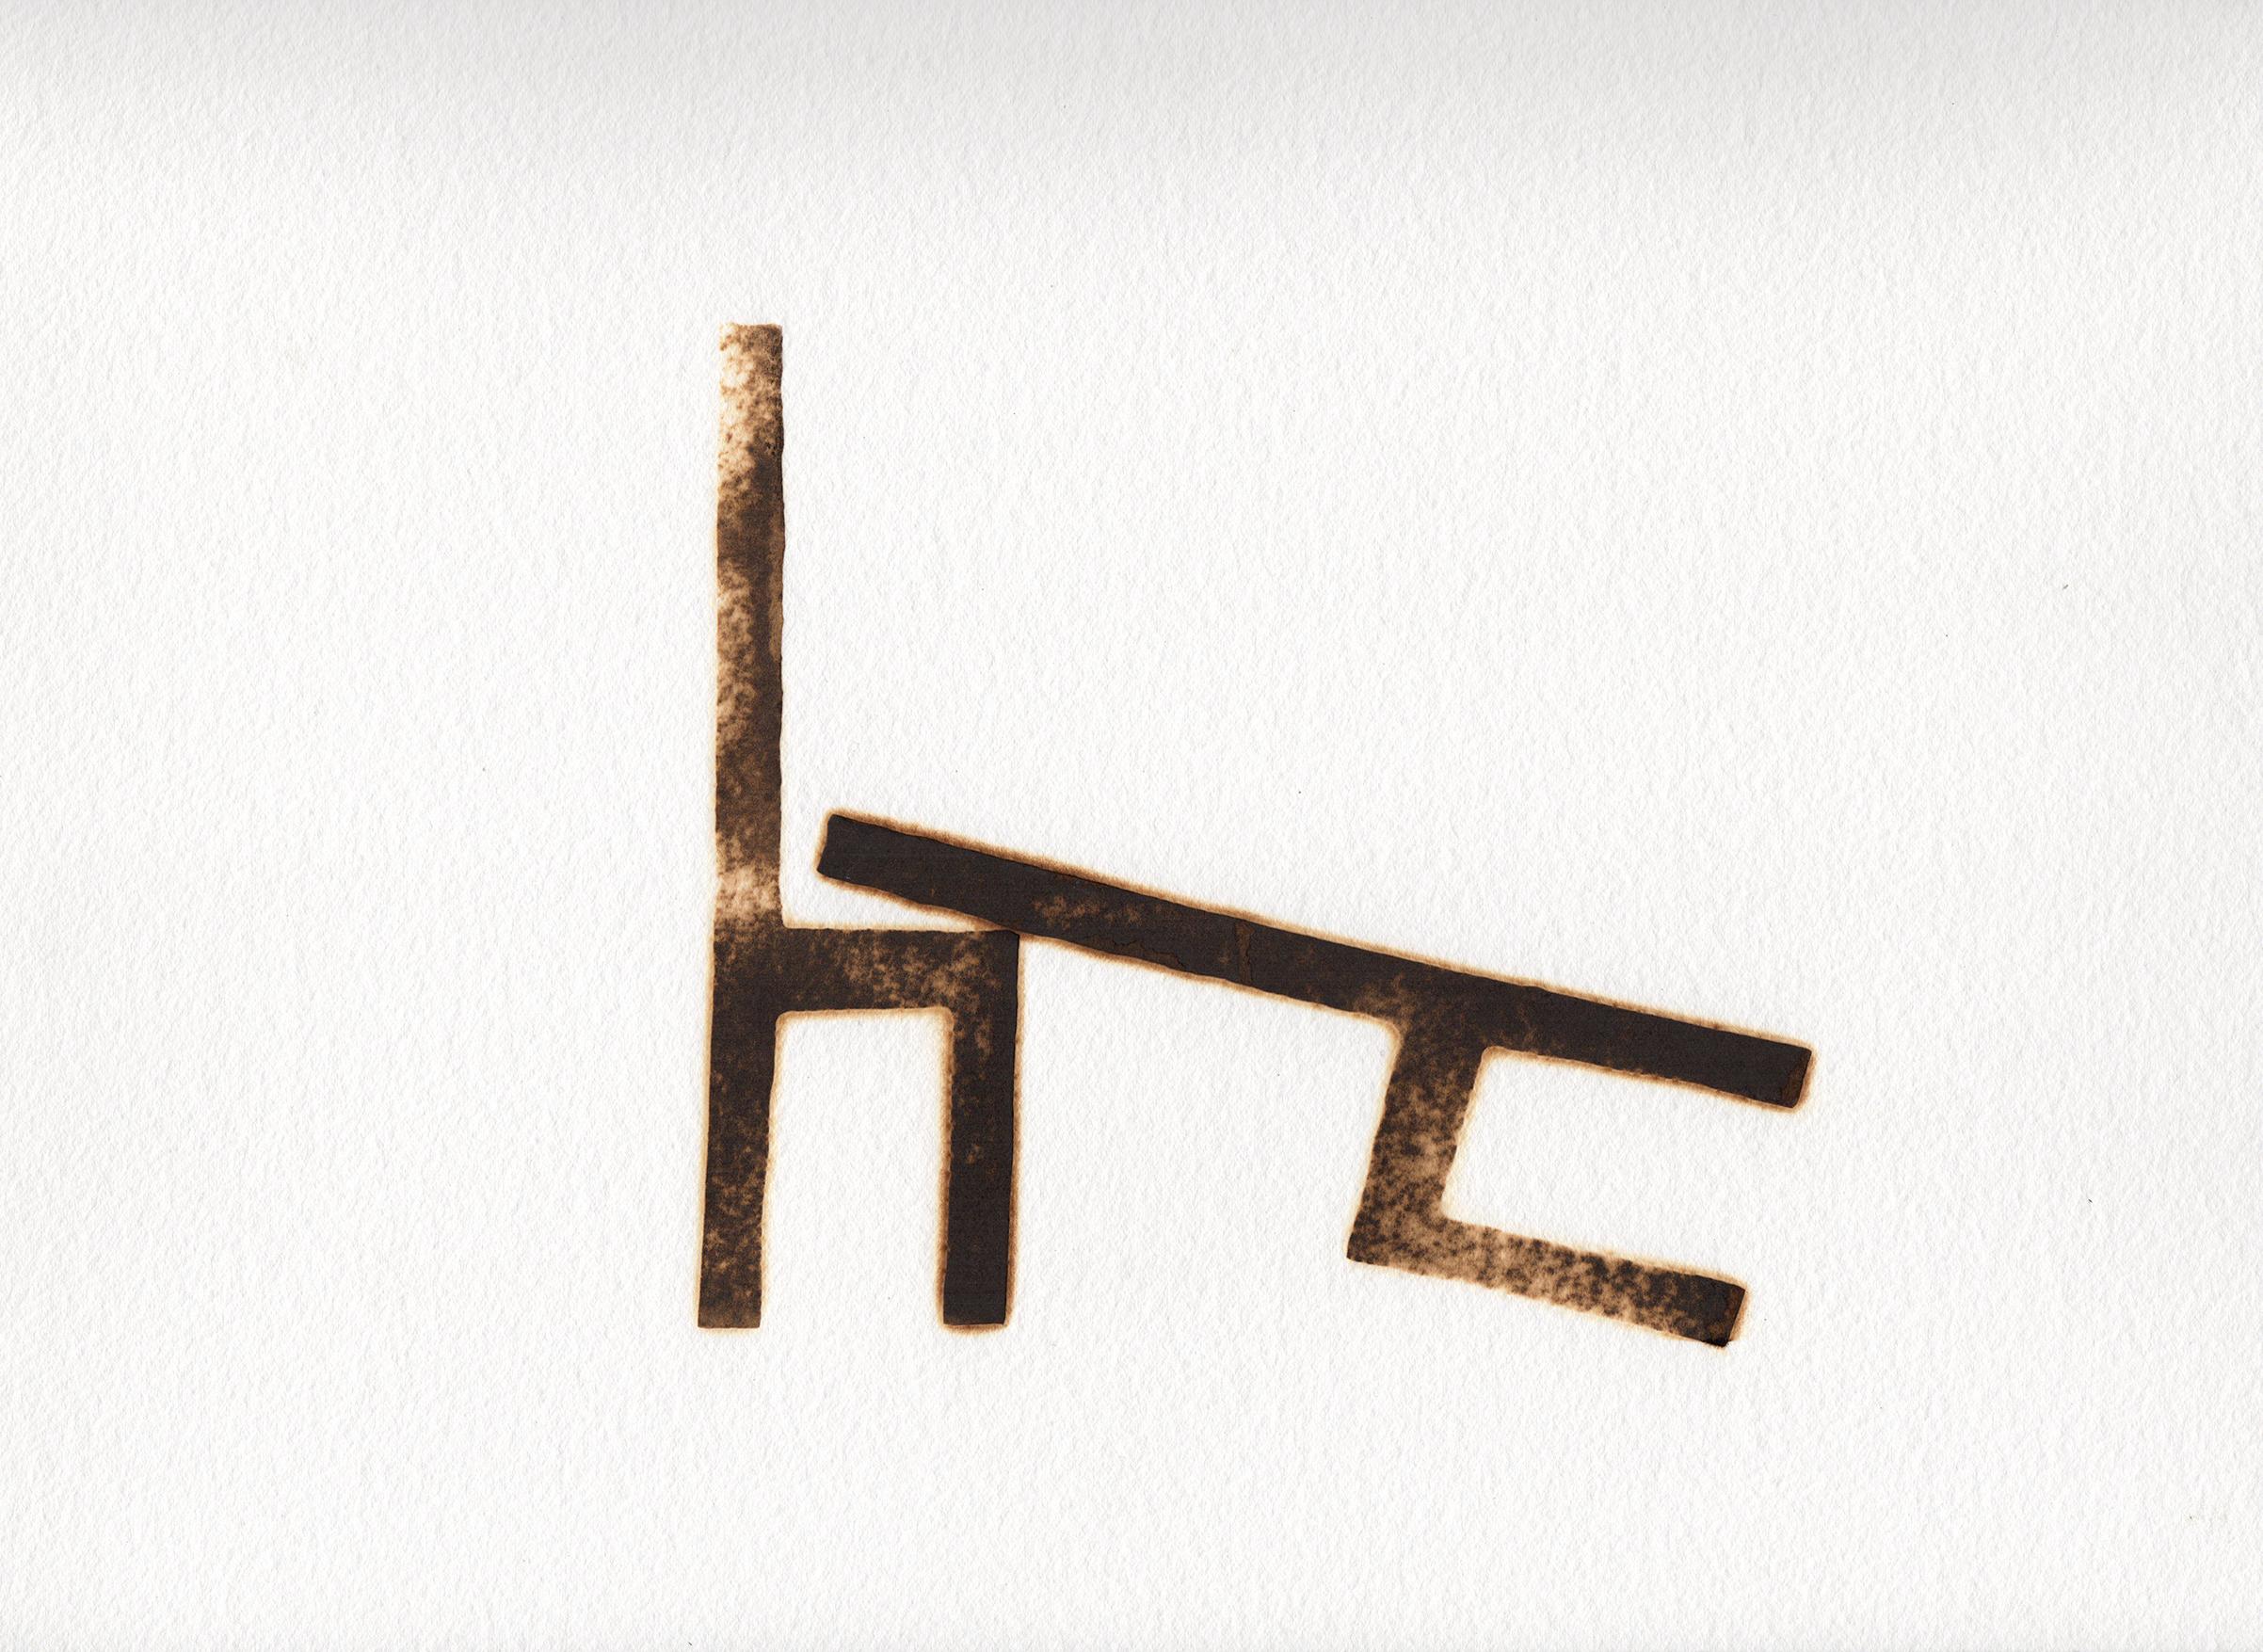 Rearranging the Furniture-detailI 2015 I   pyrograph I 16 x 11.75